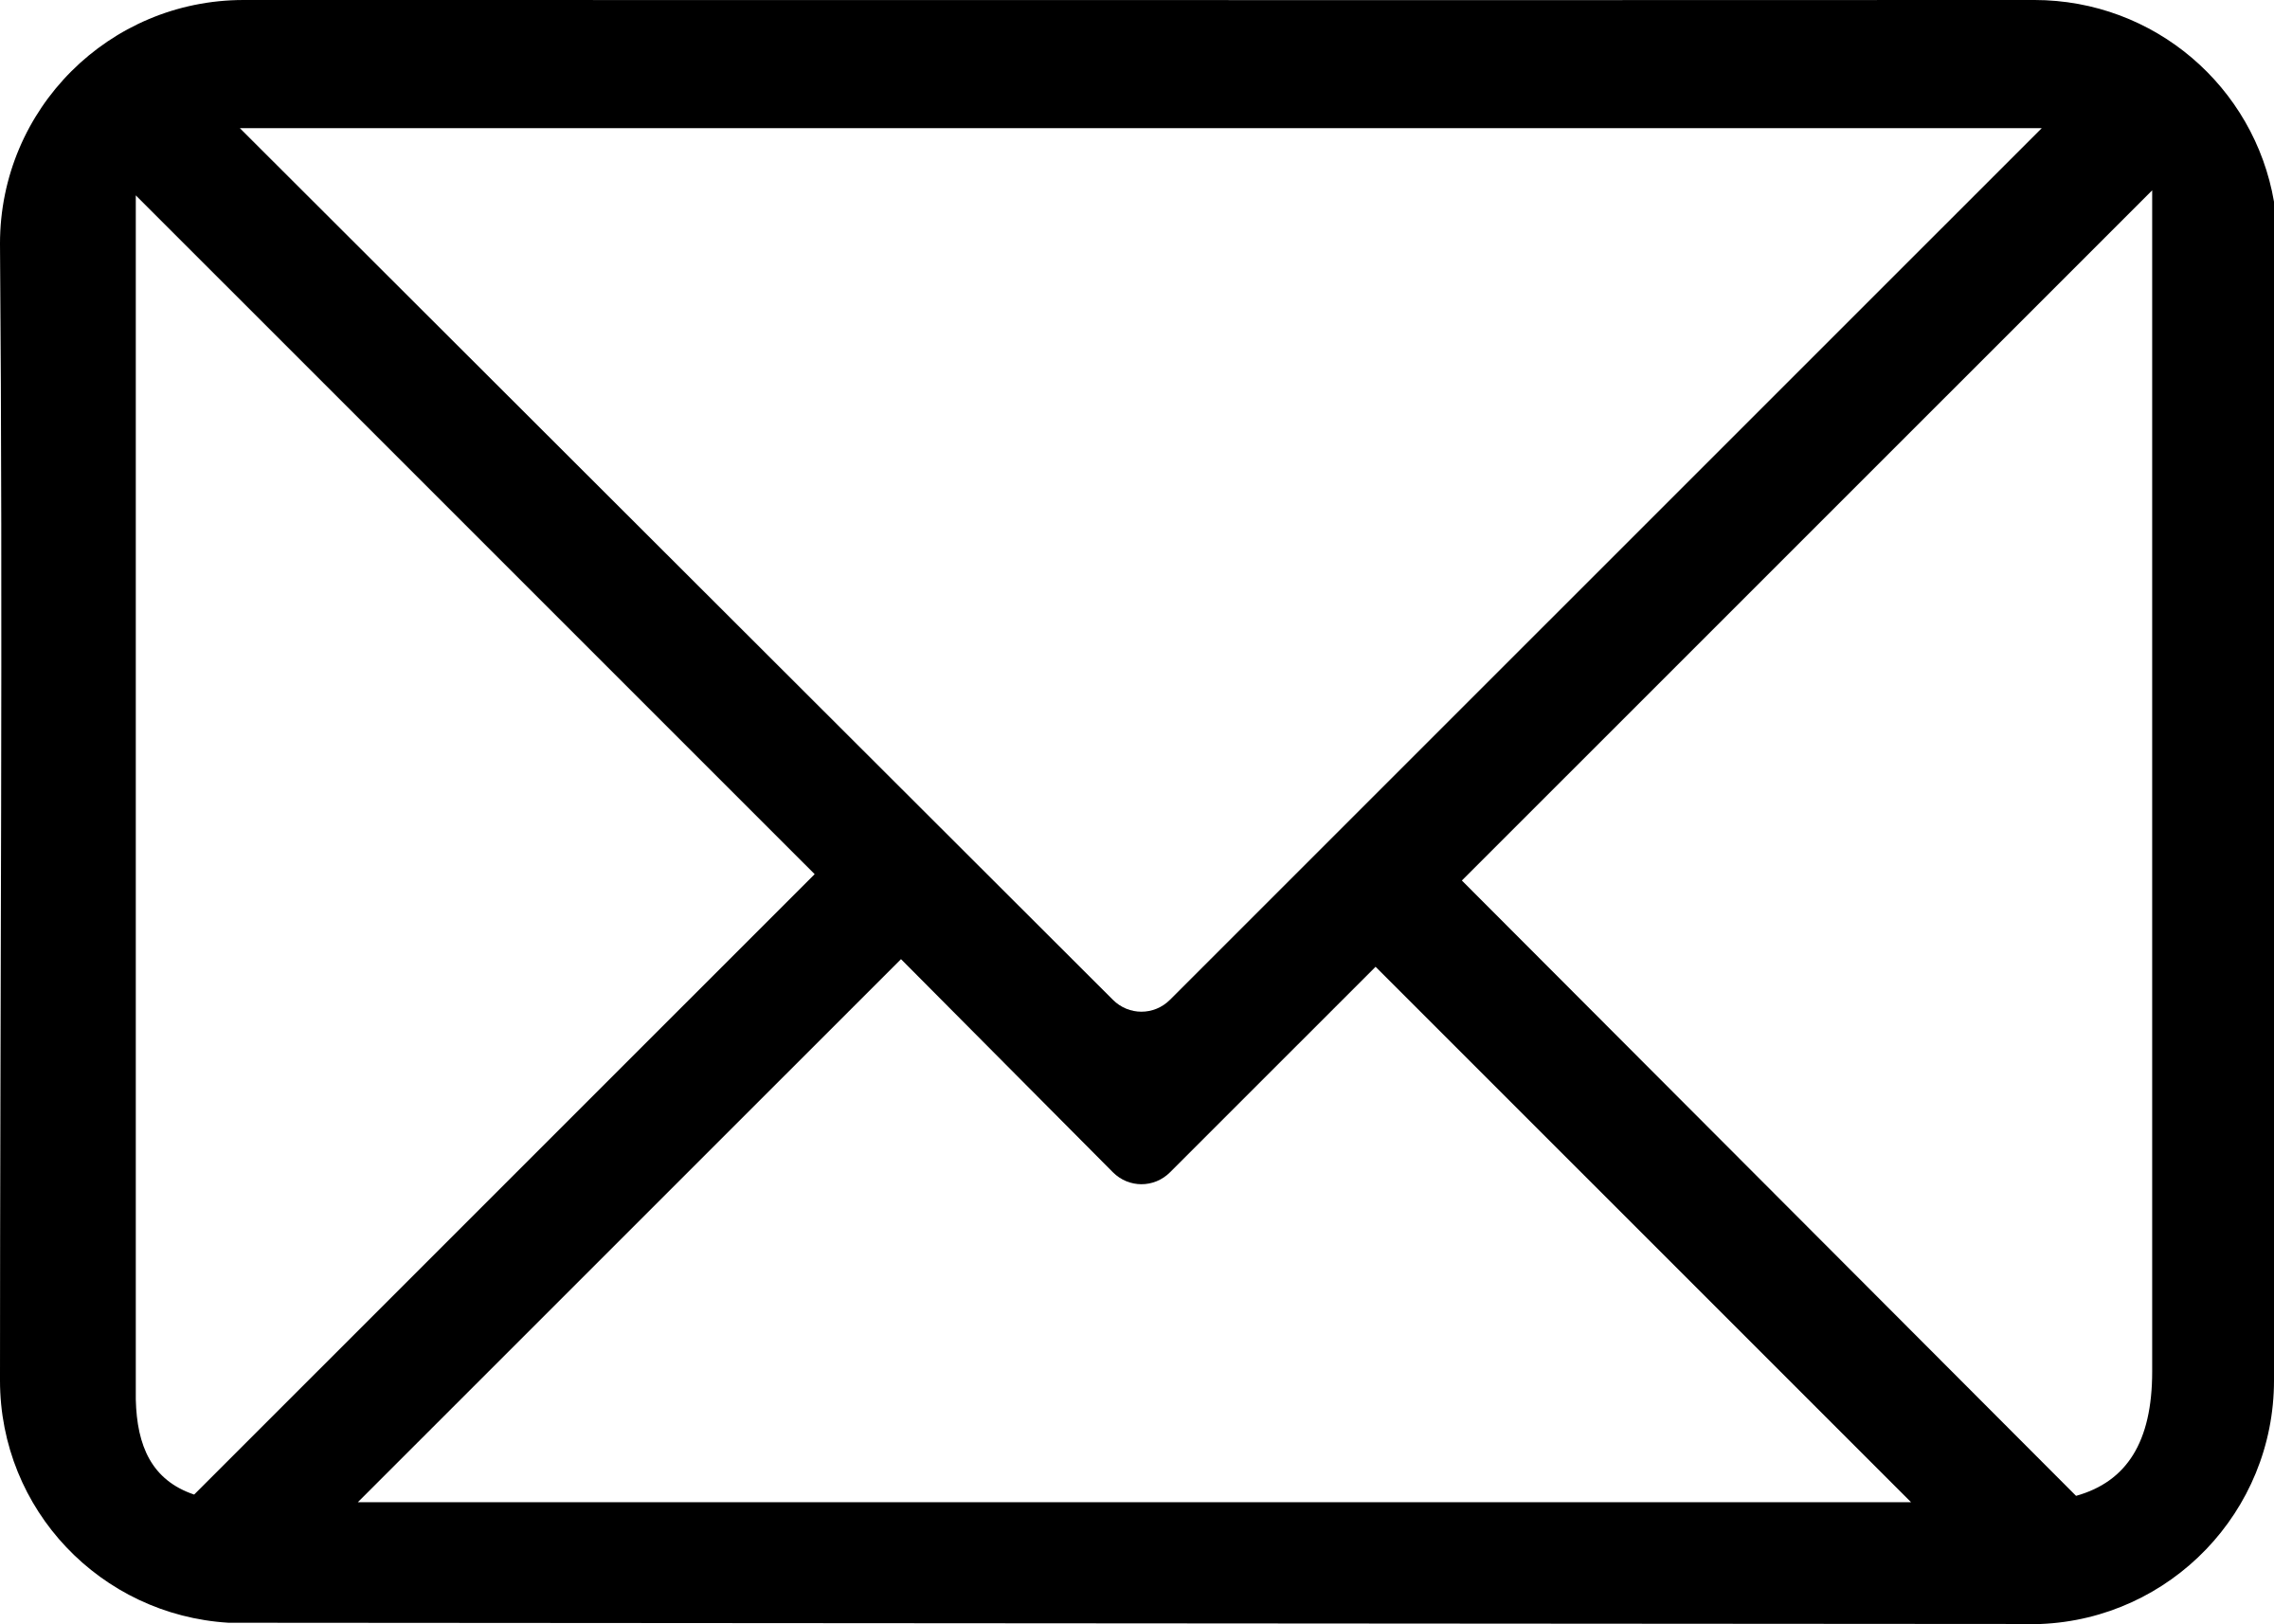 Icone Email Grande Enveloppe PNG transparents - StickPNG